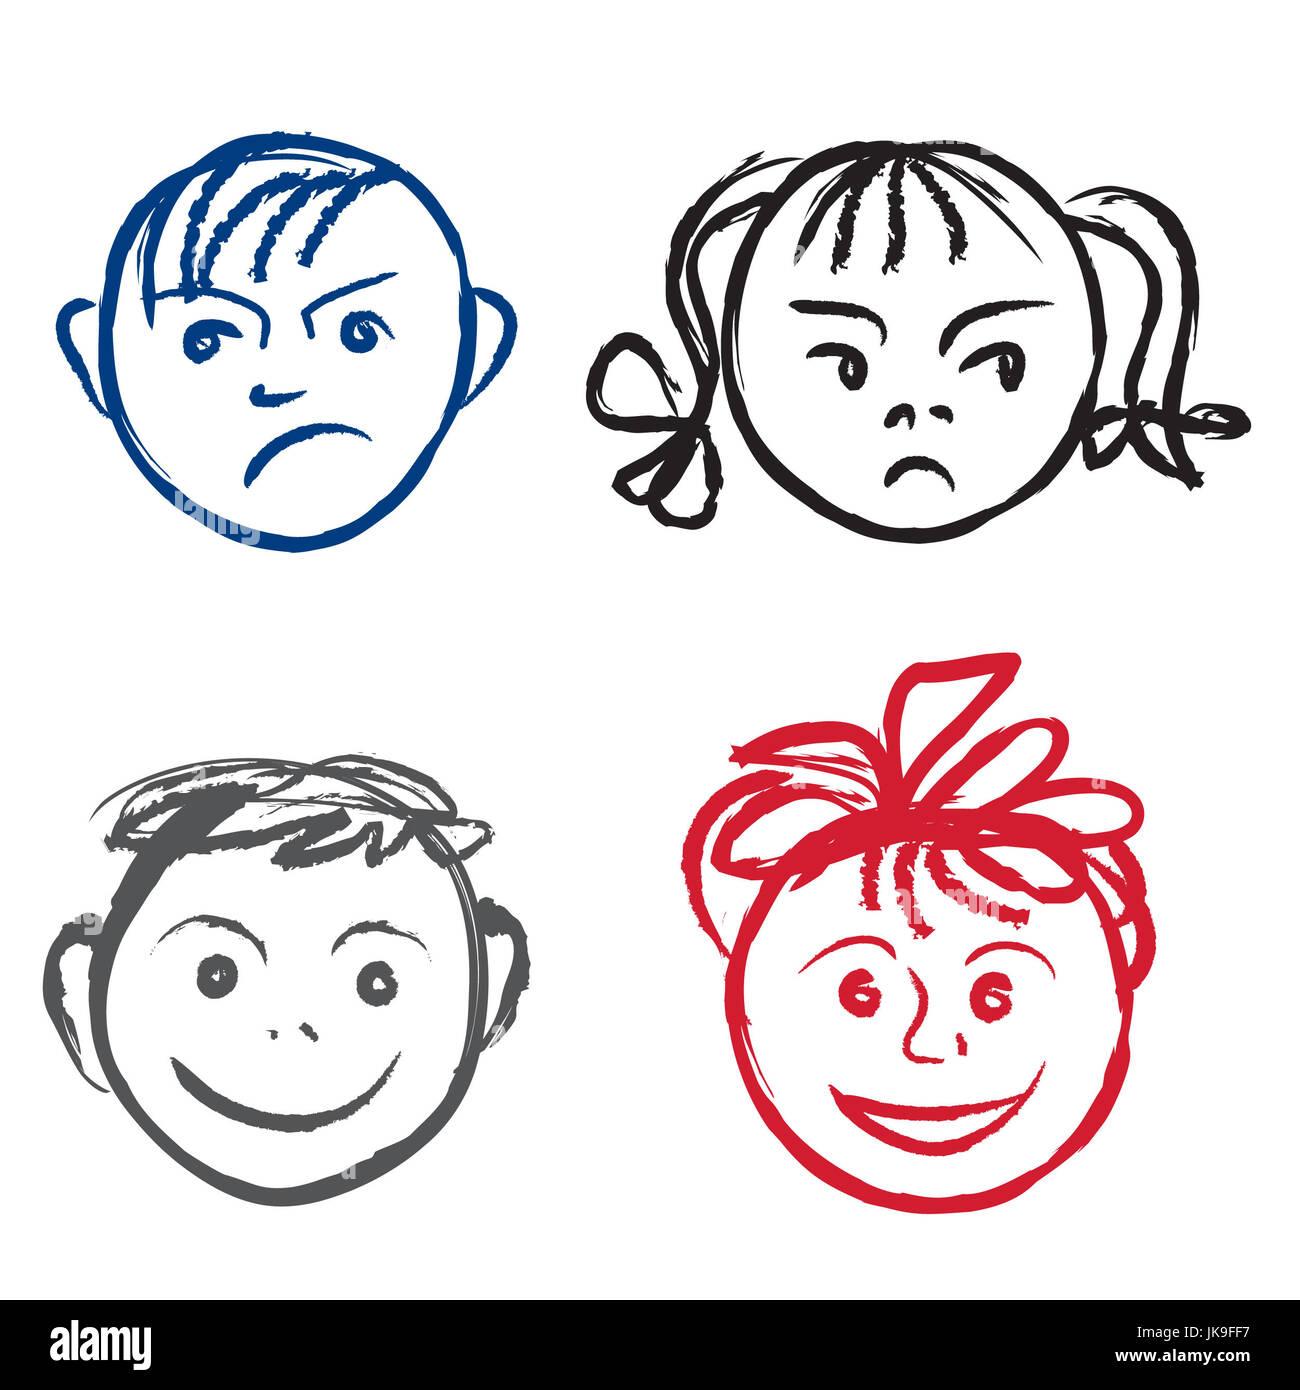 sad boy face cartoon illustration stock photos sad boy face